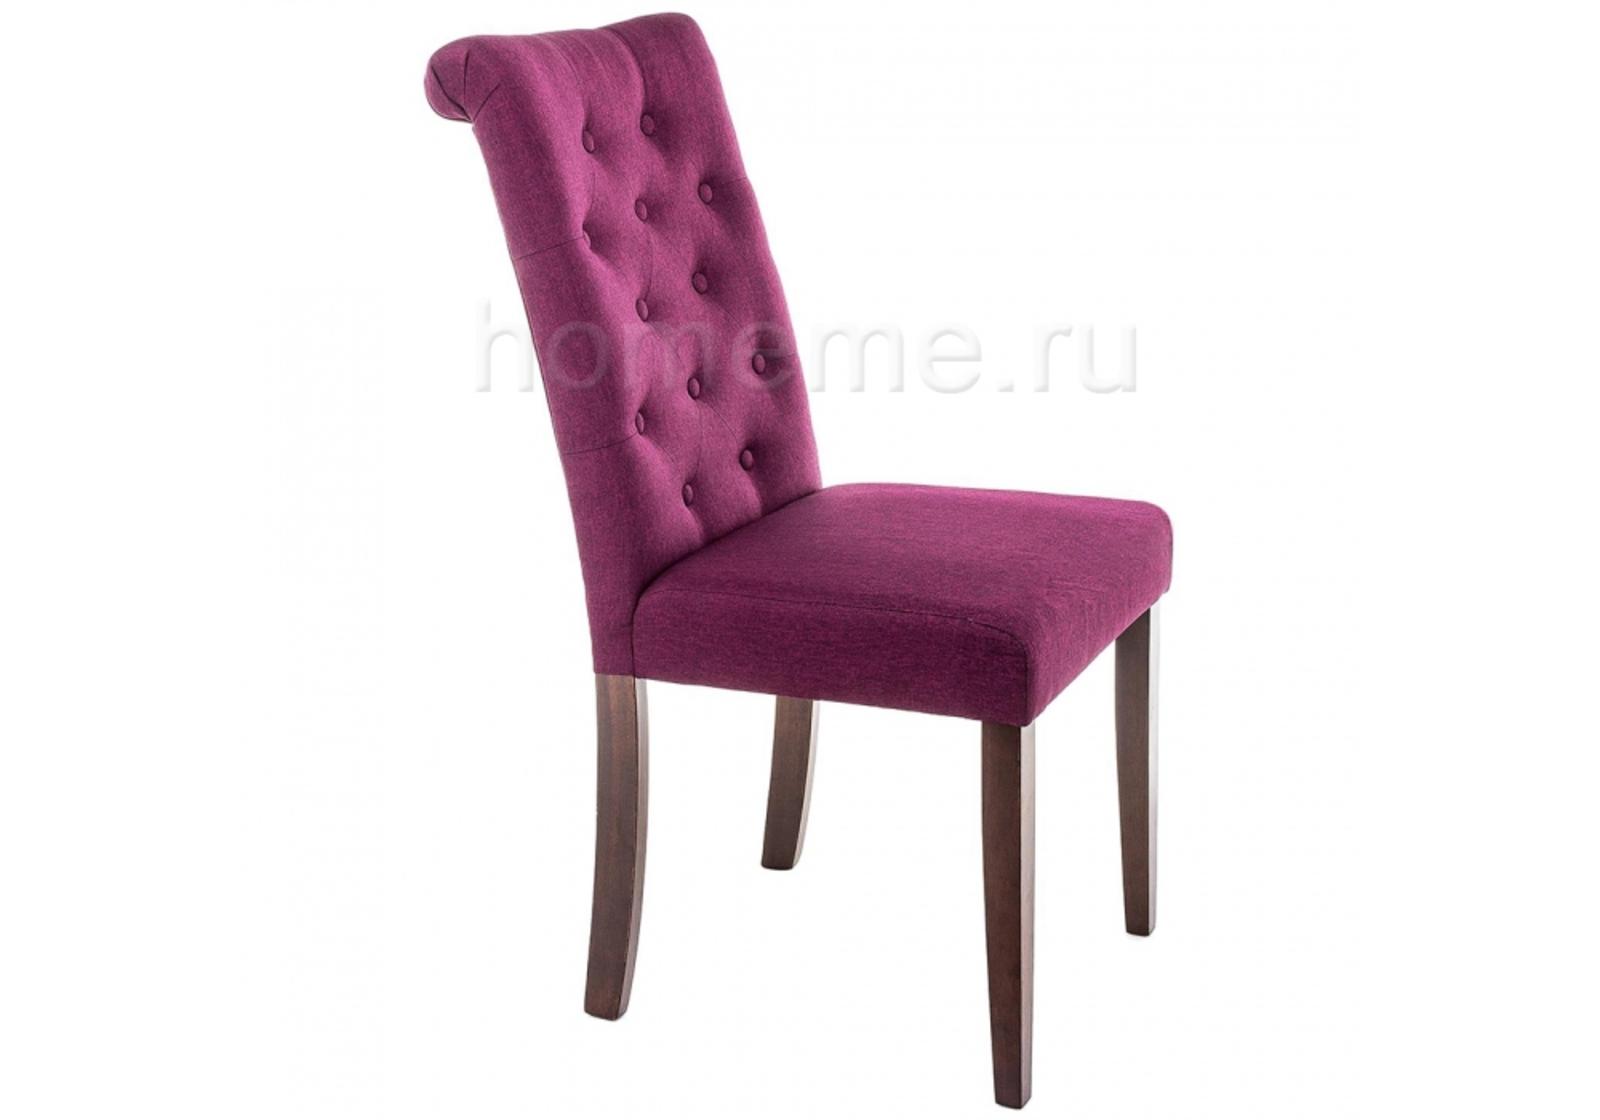 Стул HomeMe Amelia dark walnut / fabric purple 11020 от Homeme.ru